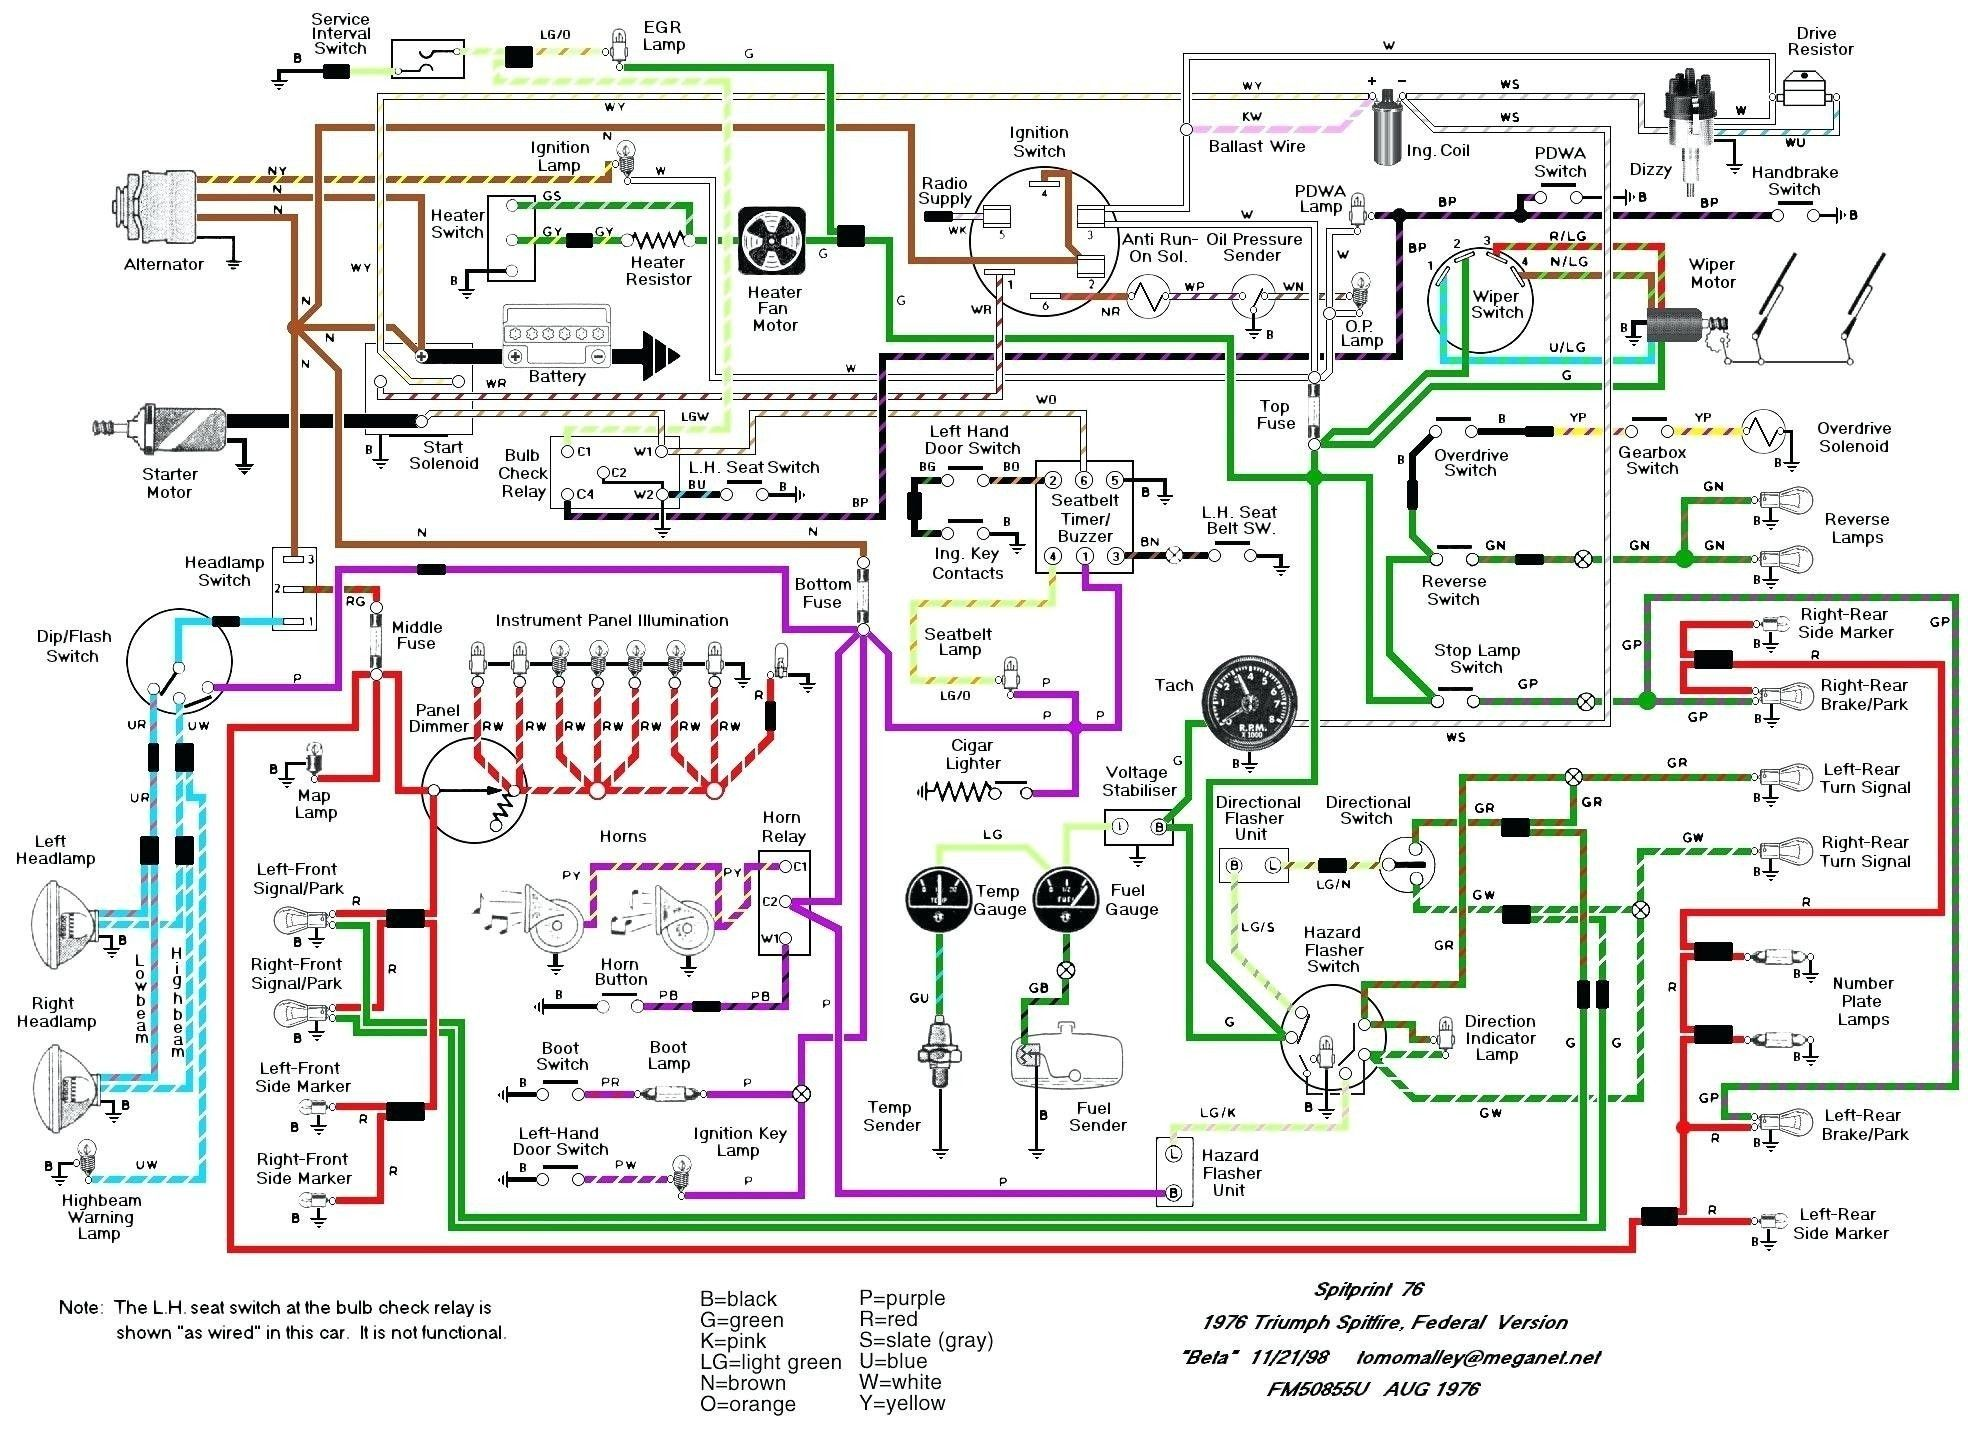 New Basic Automotive Wiring Diagrams Diagram Wiringdiagram Diagramming Diagramm Visuals Electrical Circuit Diagram House Wiring Electrical Wiring Diagram